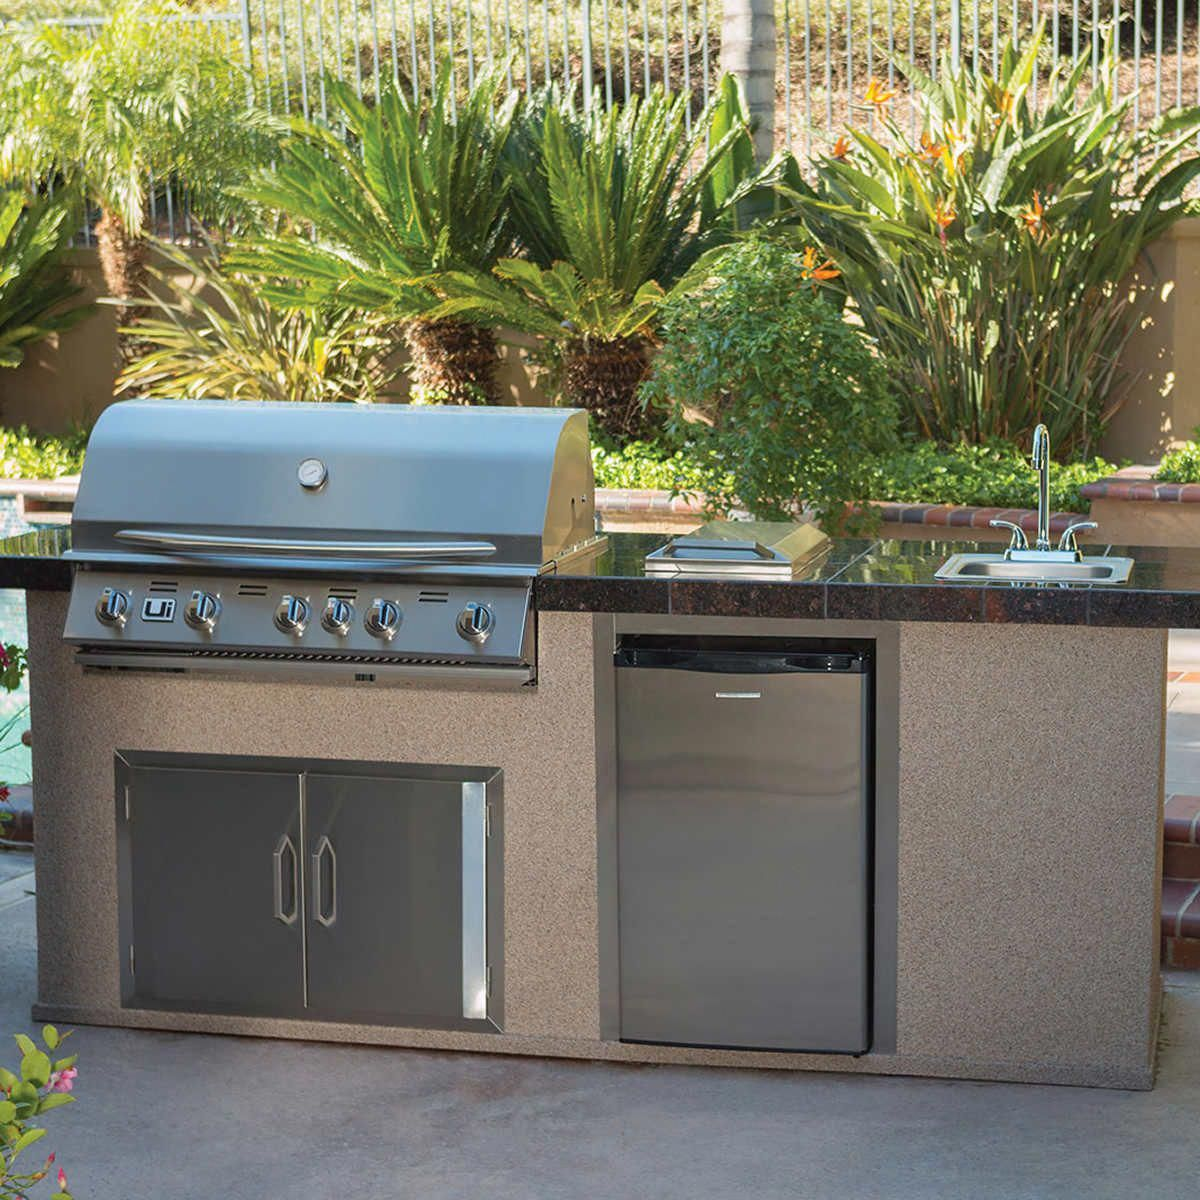 Urban islands stainless steel 38 5burner dropin grill